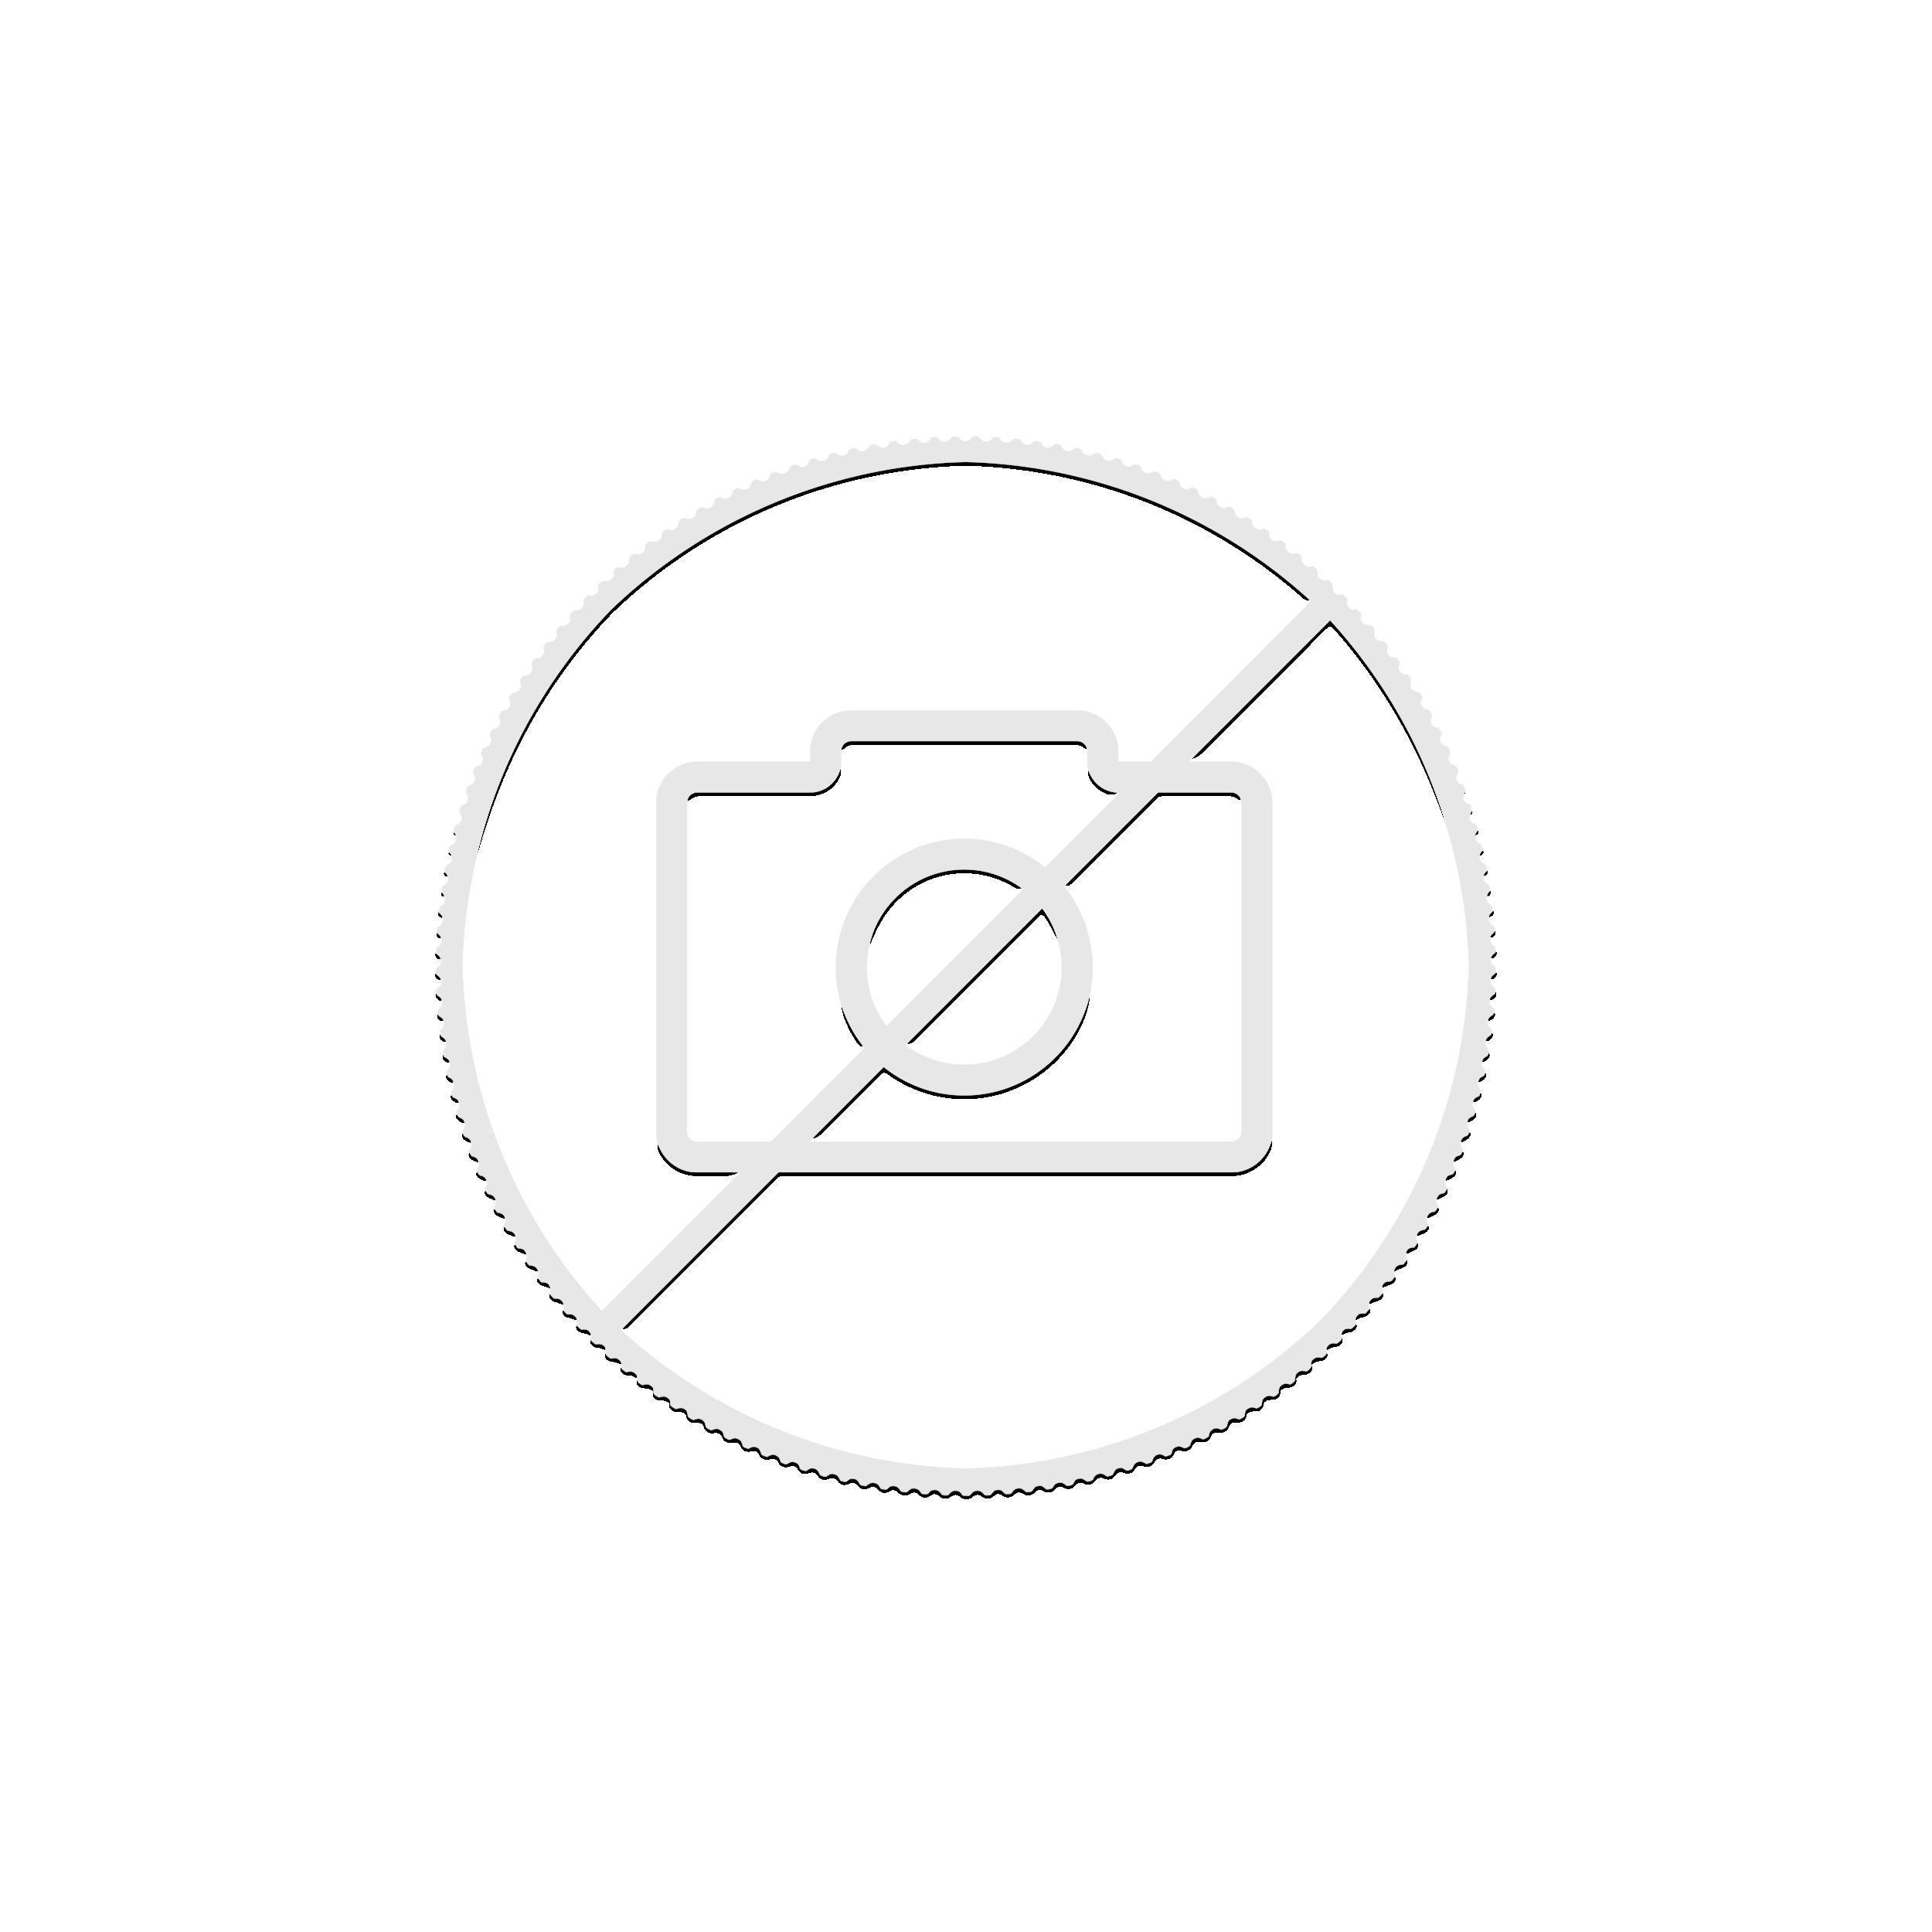 2 troy ounce zilveren munt Jurassic World 2021